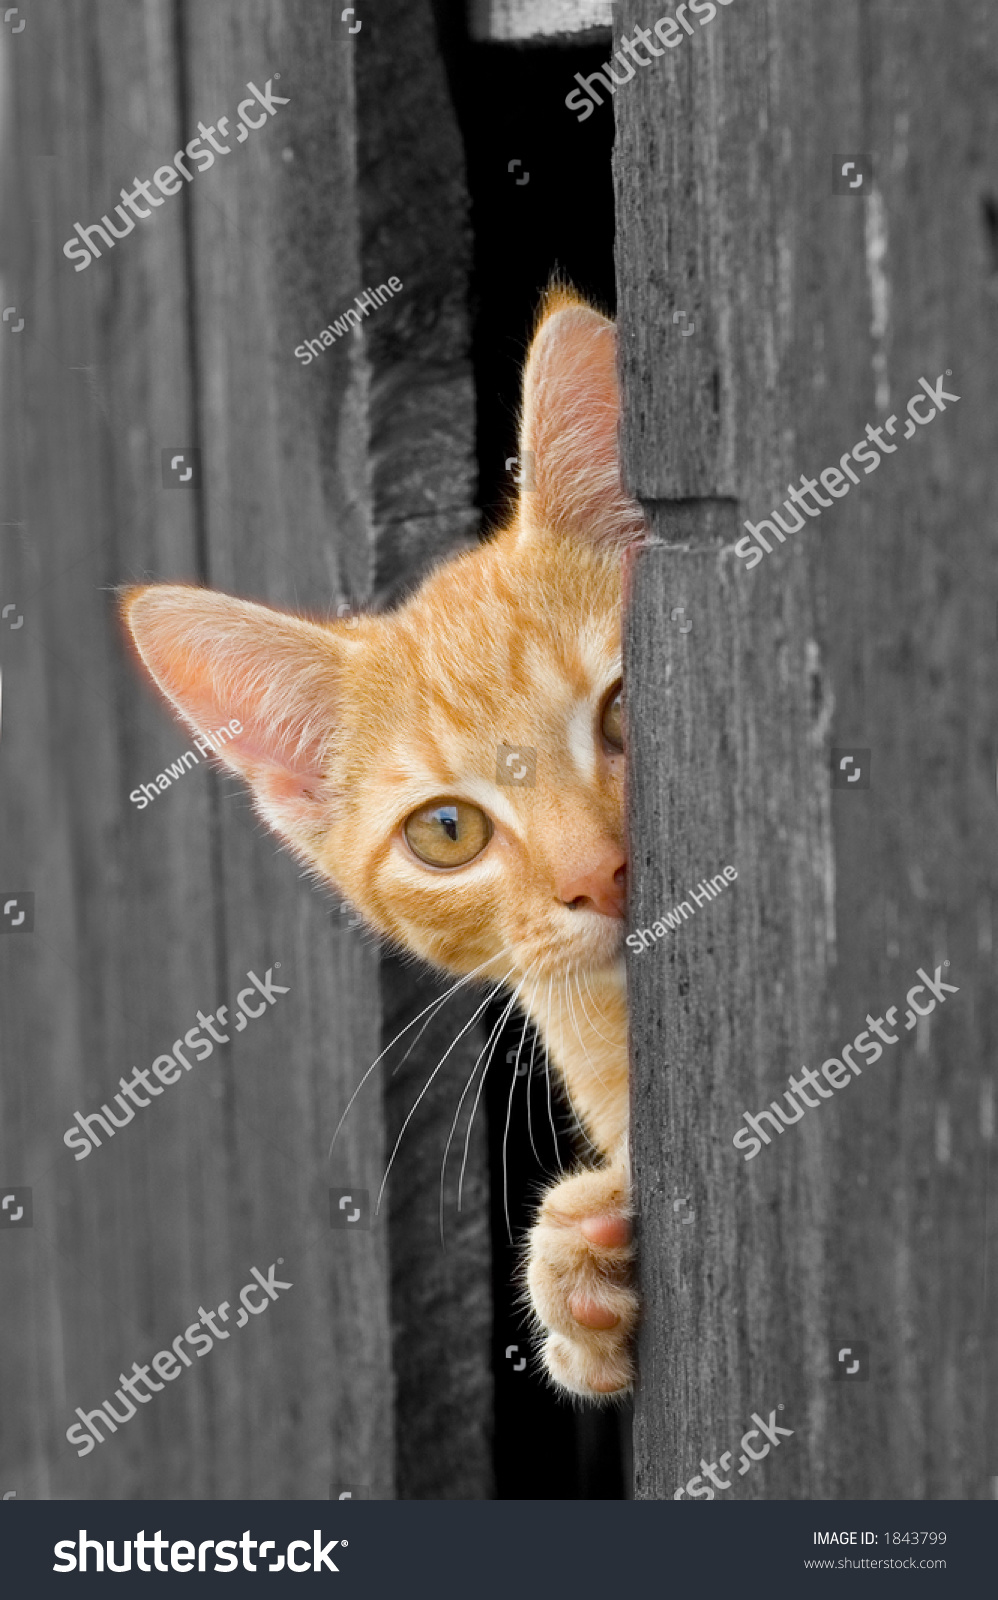 Cat peeking from Barn Door (B\u0026W with cat in color) & Cat Peeking Barn Door Bw Cat Stock Photo 1843799 - Shutterstock Pezcame.Com